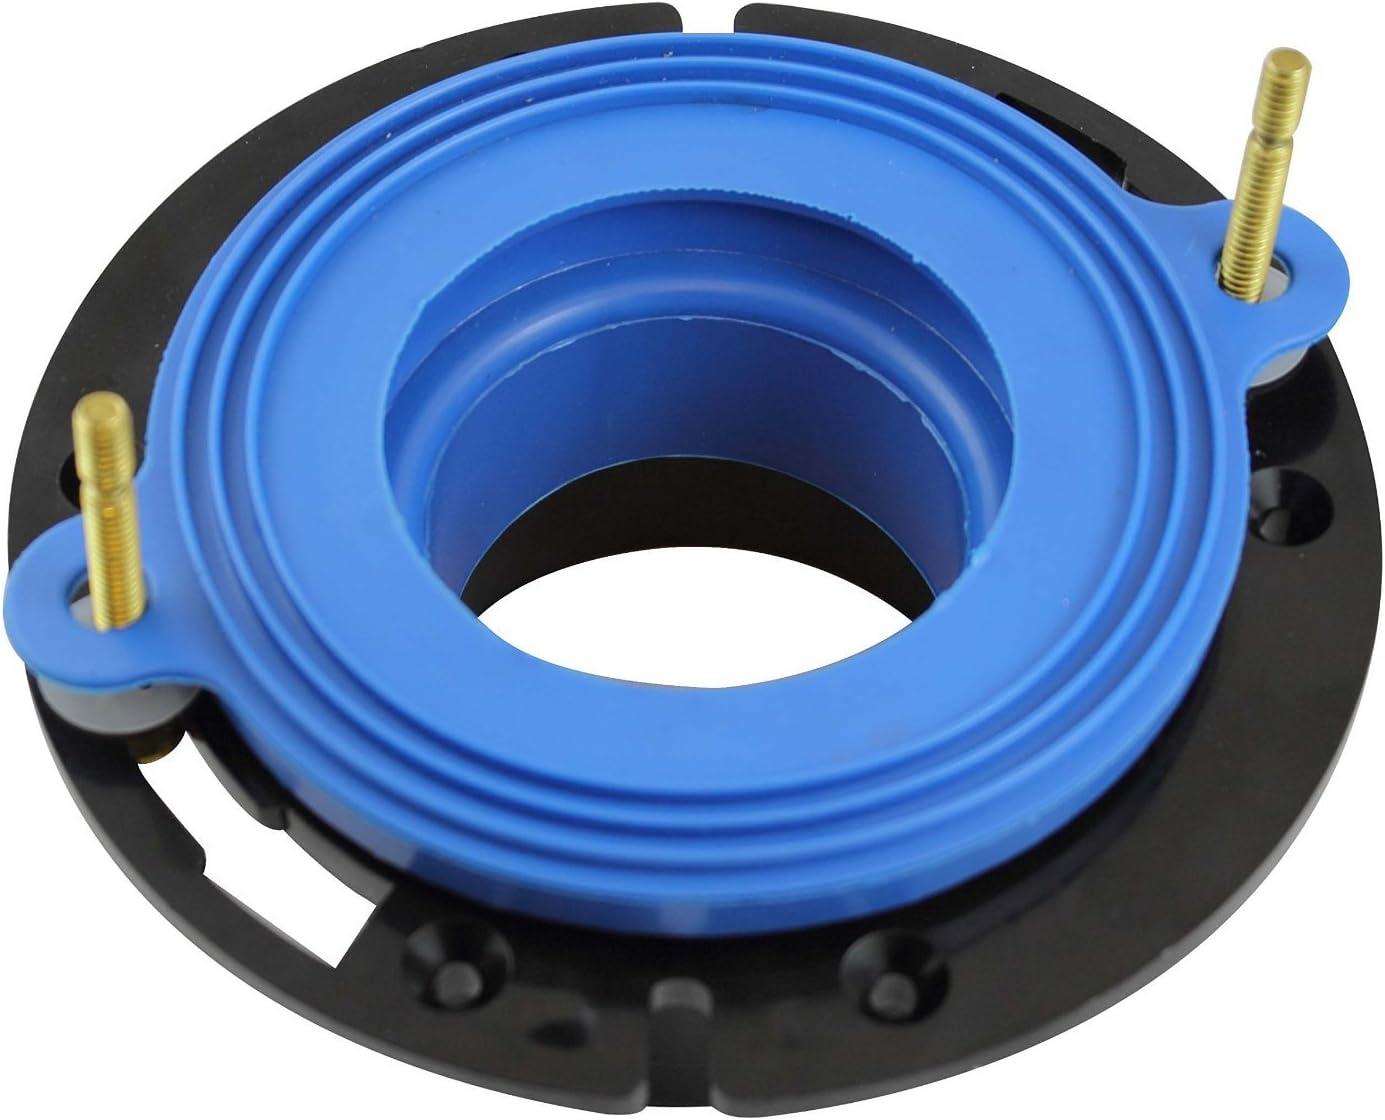 71O1q9tD1dL._AC._SR360460 toilet repair kits amazon com rough plumbing toilet parts